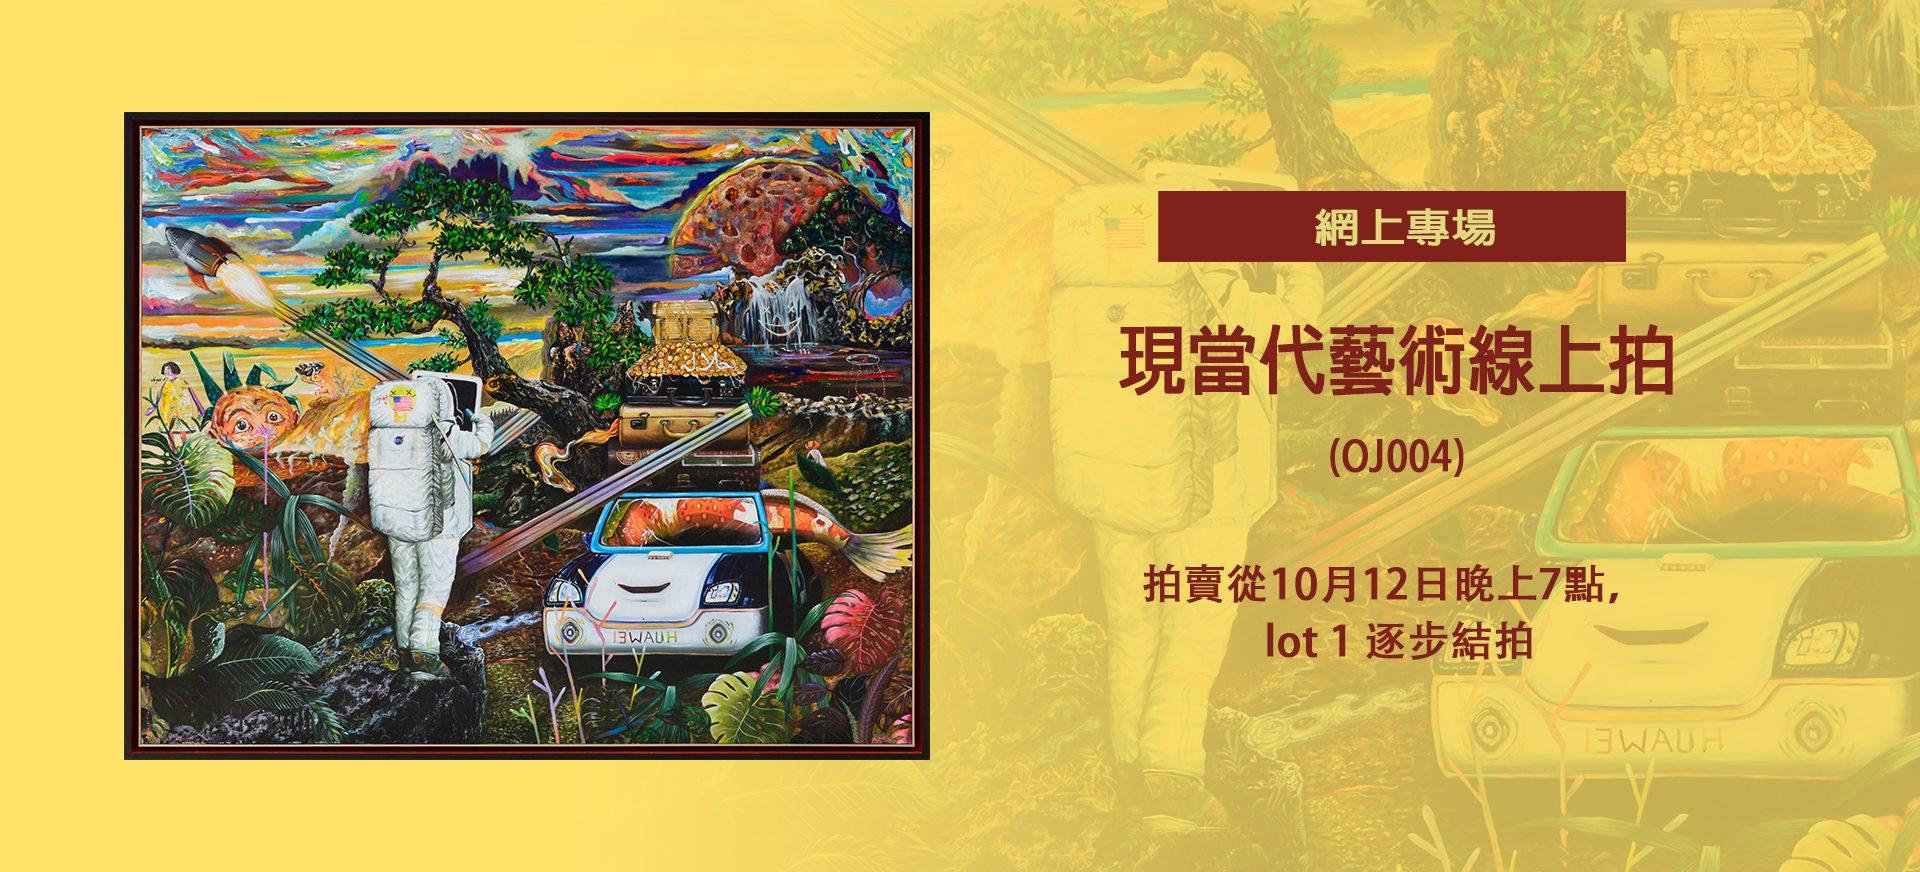 1920x872_OJ004_Mobile_Chinese